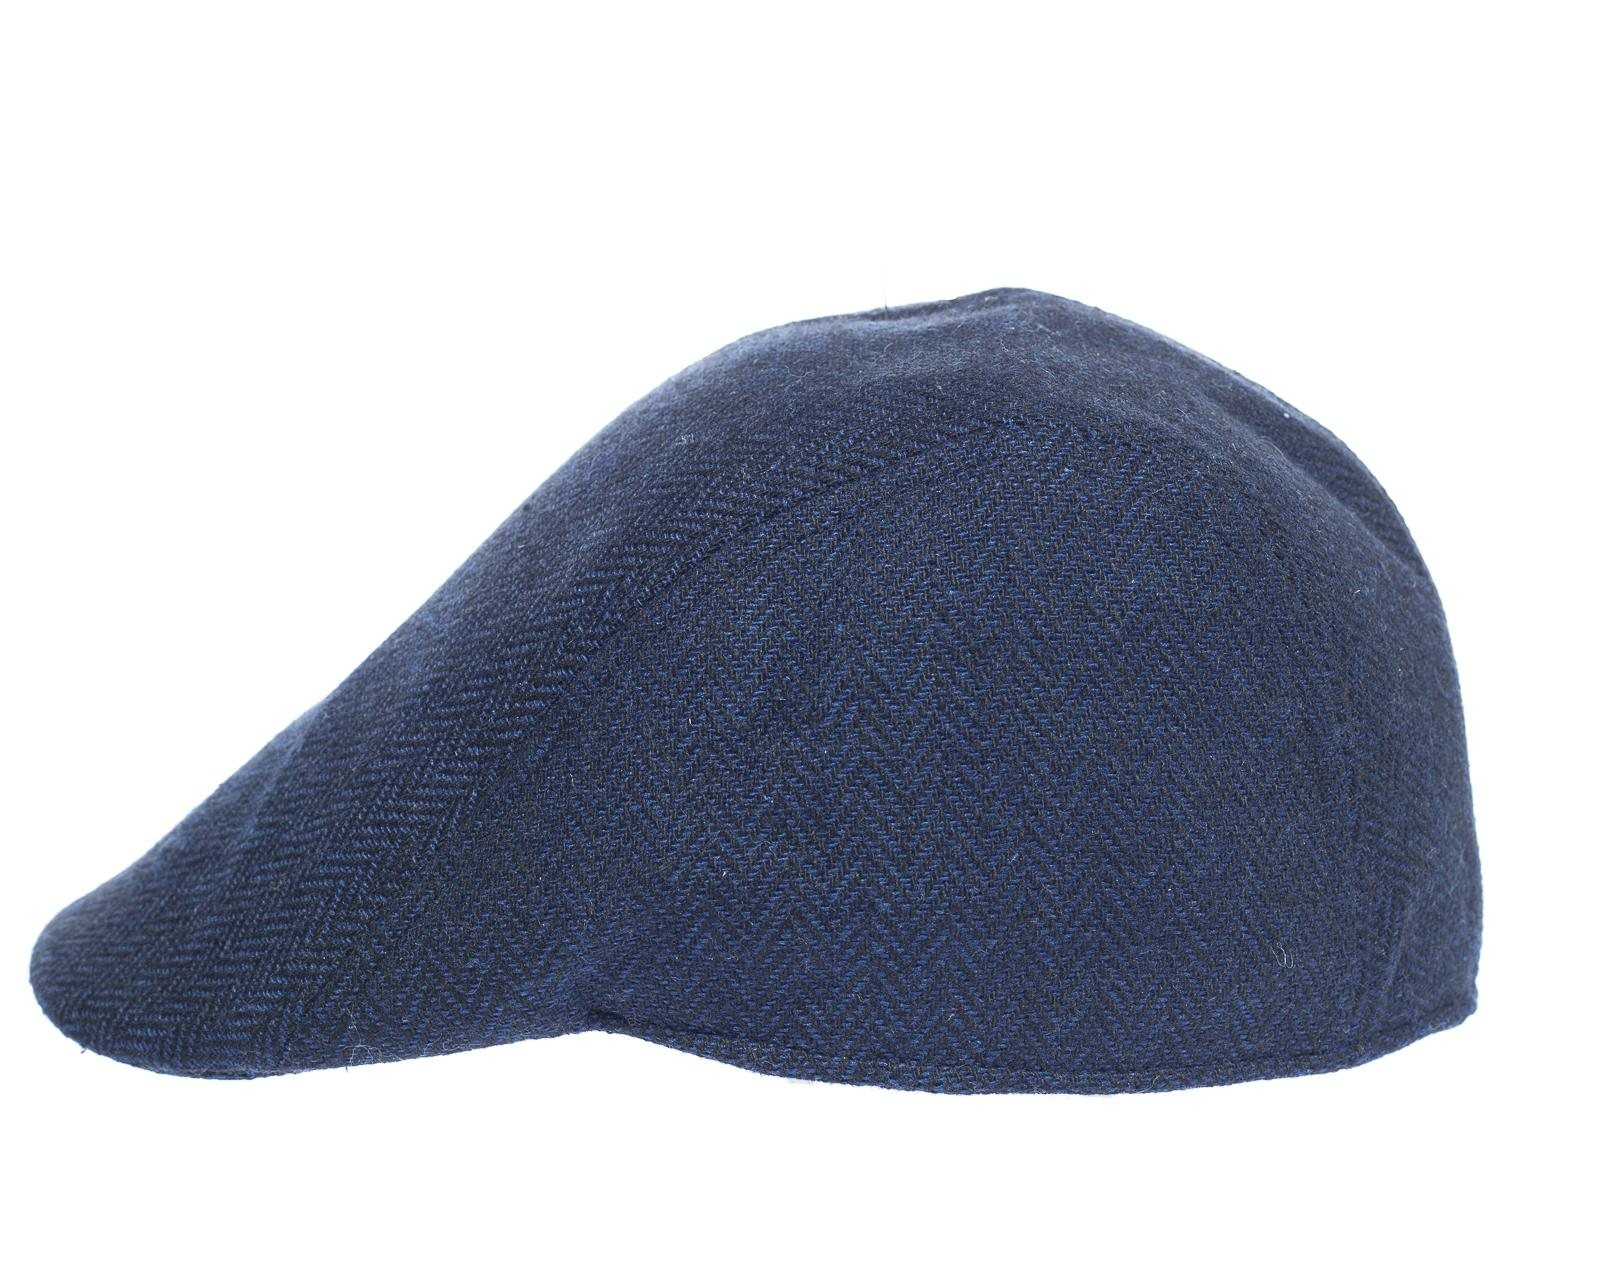 Newsboy Wool Blend Cap Paperboy Men Boy Gatsby Hipster Ivy Hat, Herringbone Blue